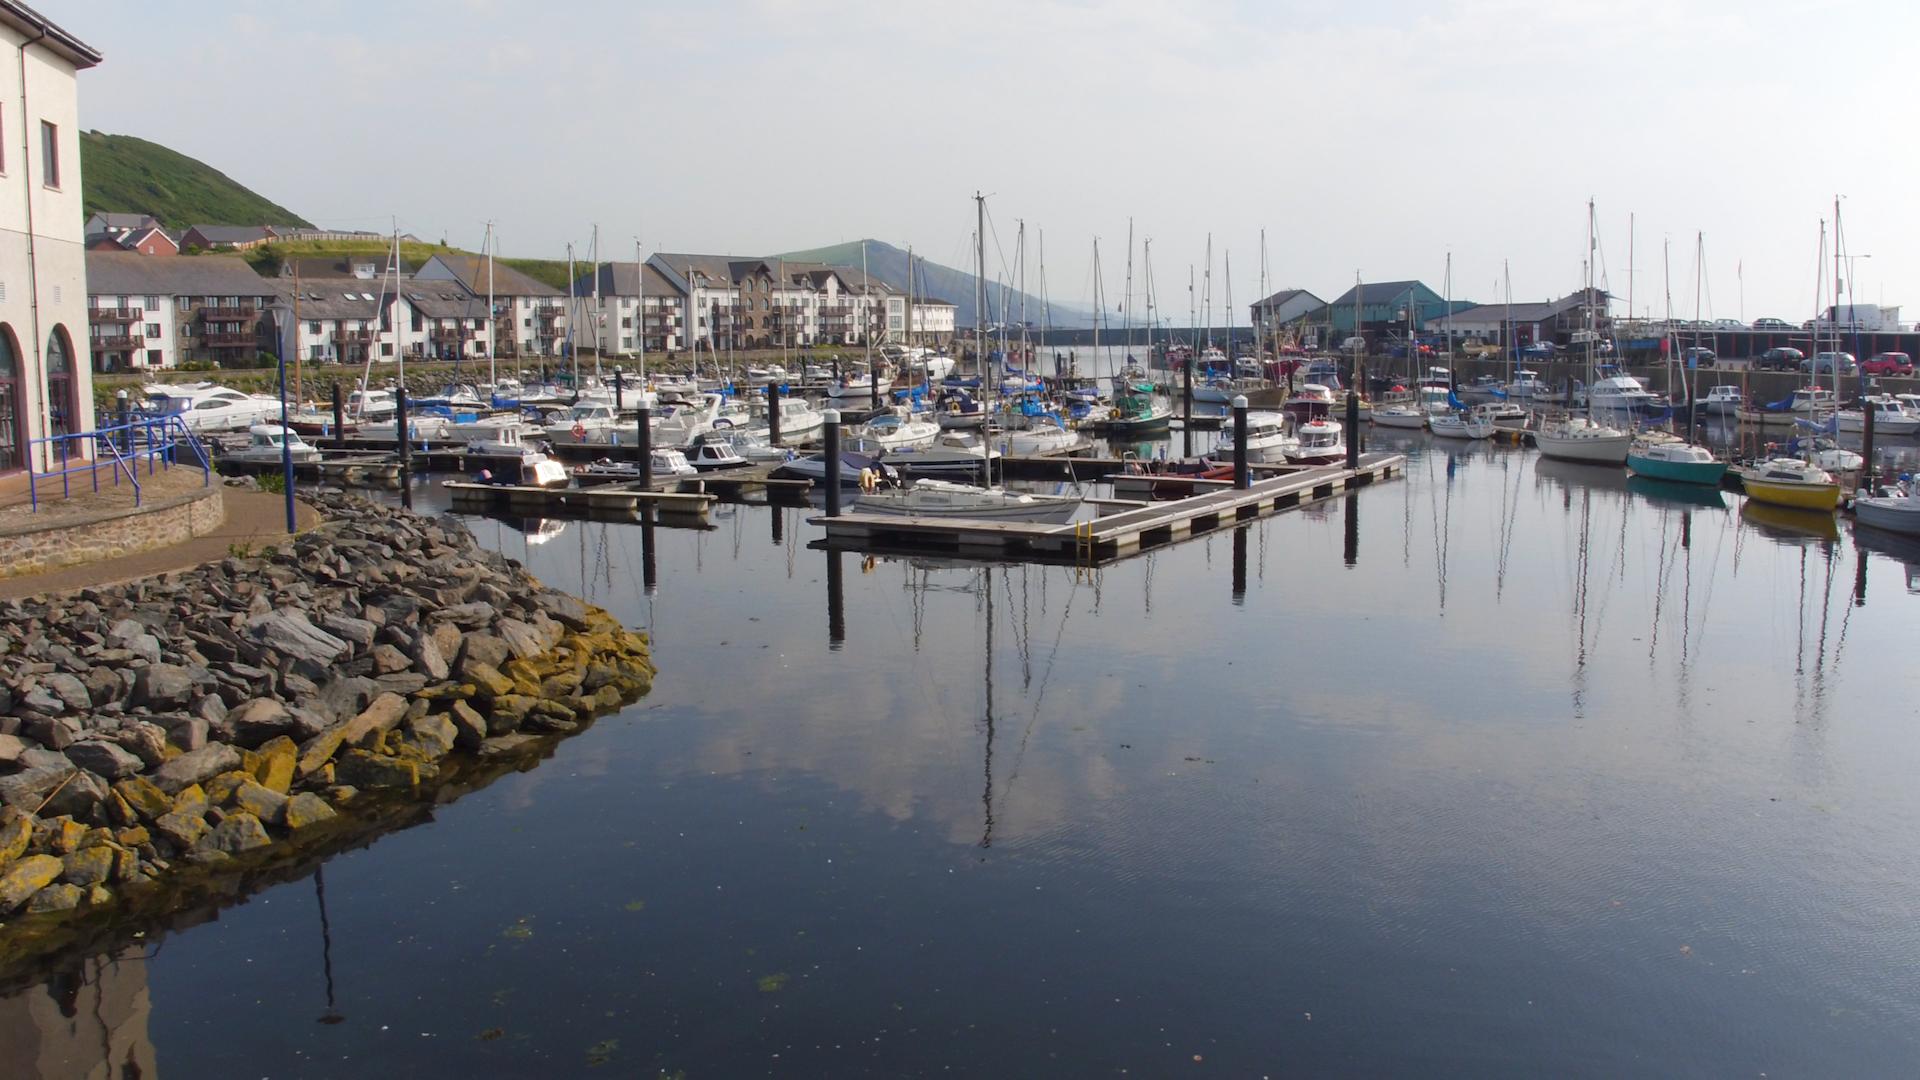 Aberystwyth Marina The Marine Group